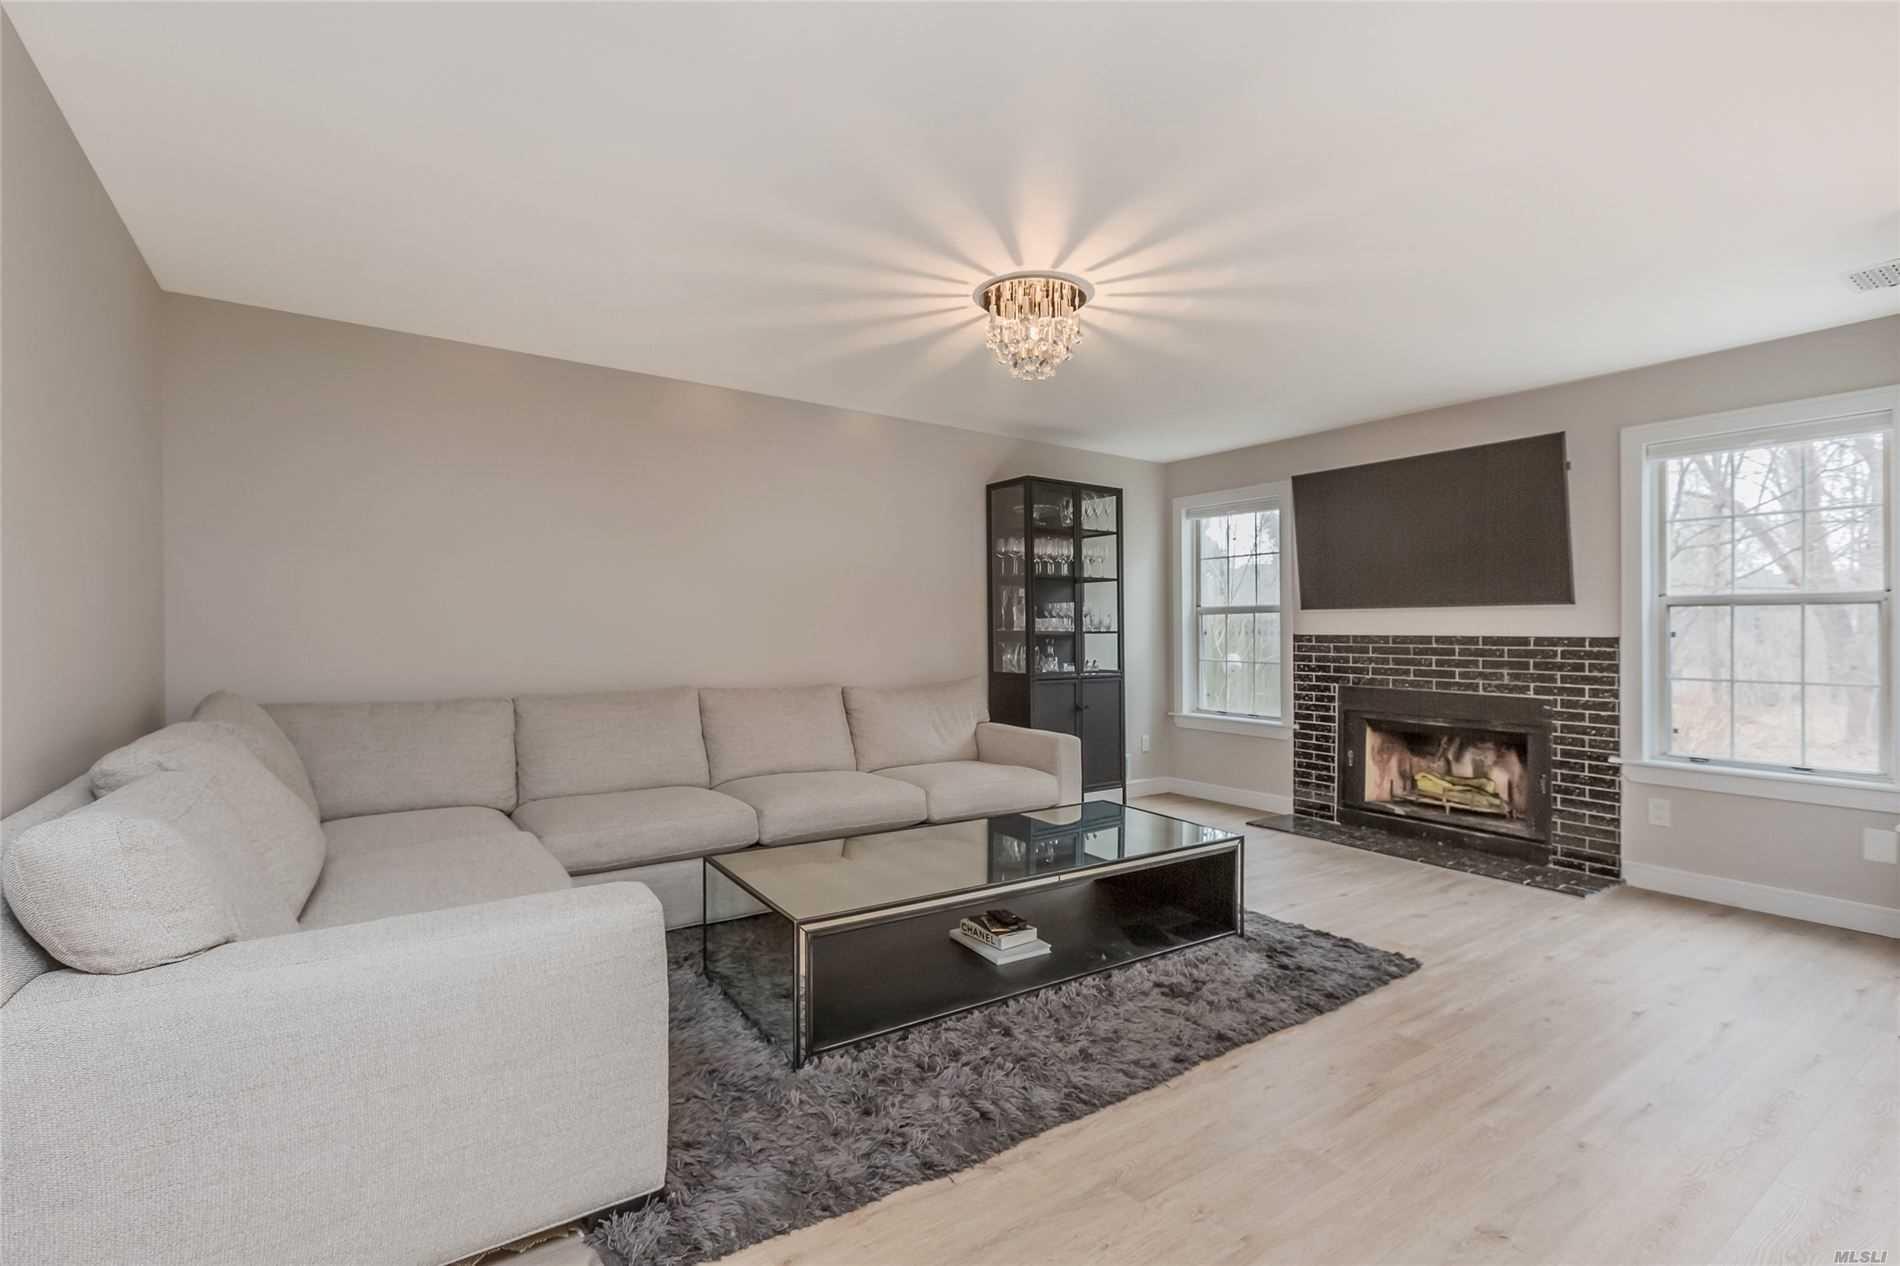 Property for sale at 4 Victorian Court, Huntington NY 11743, Huntington,  New York 11743